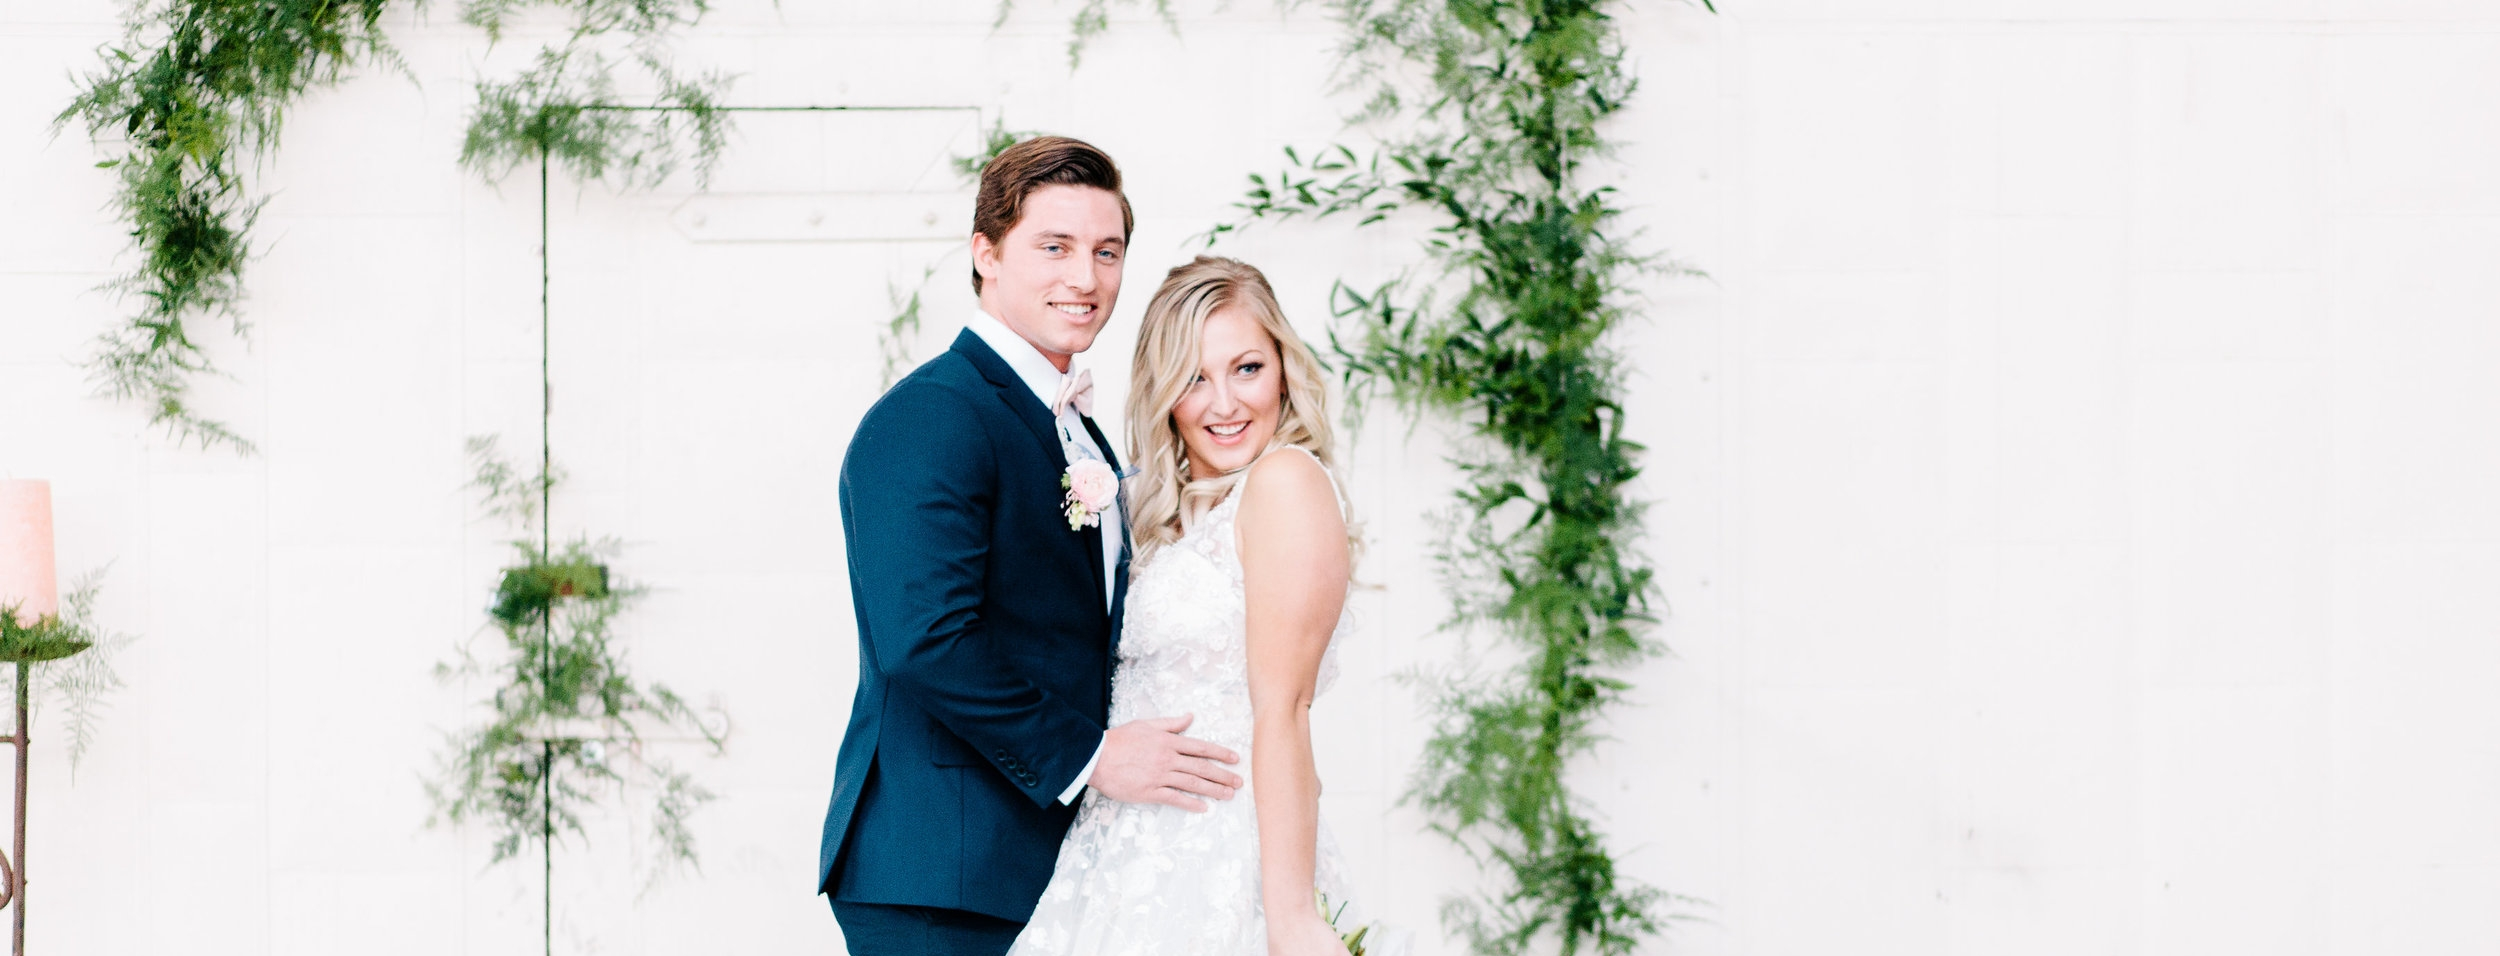 WeddingBoston_Blush_EisleyImages-424.jpg